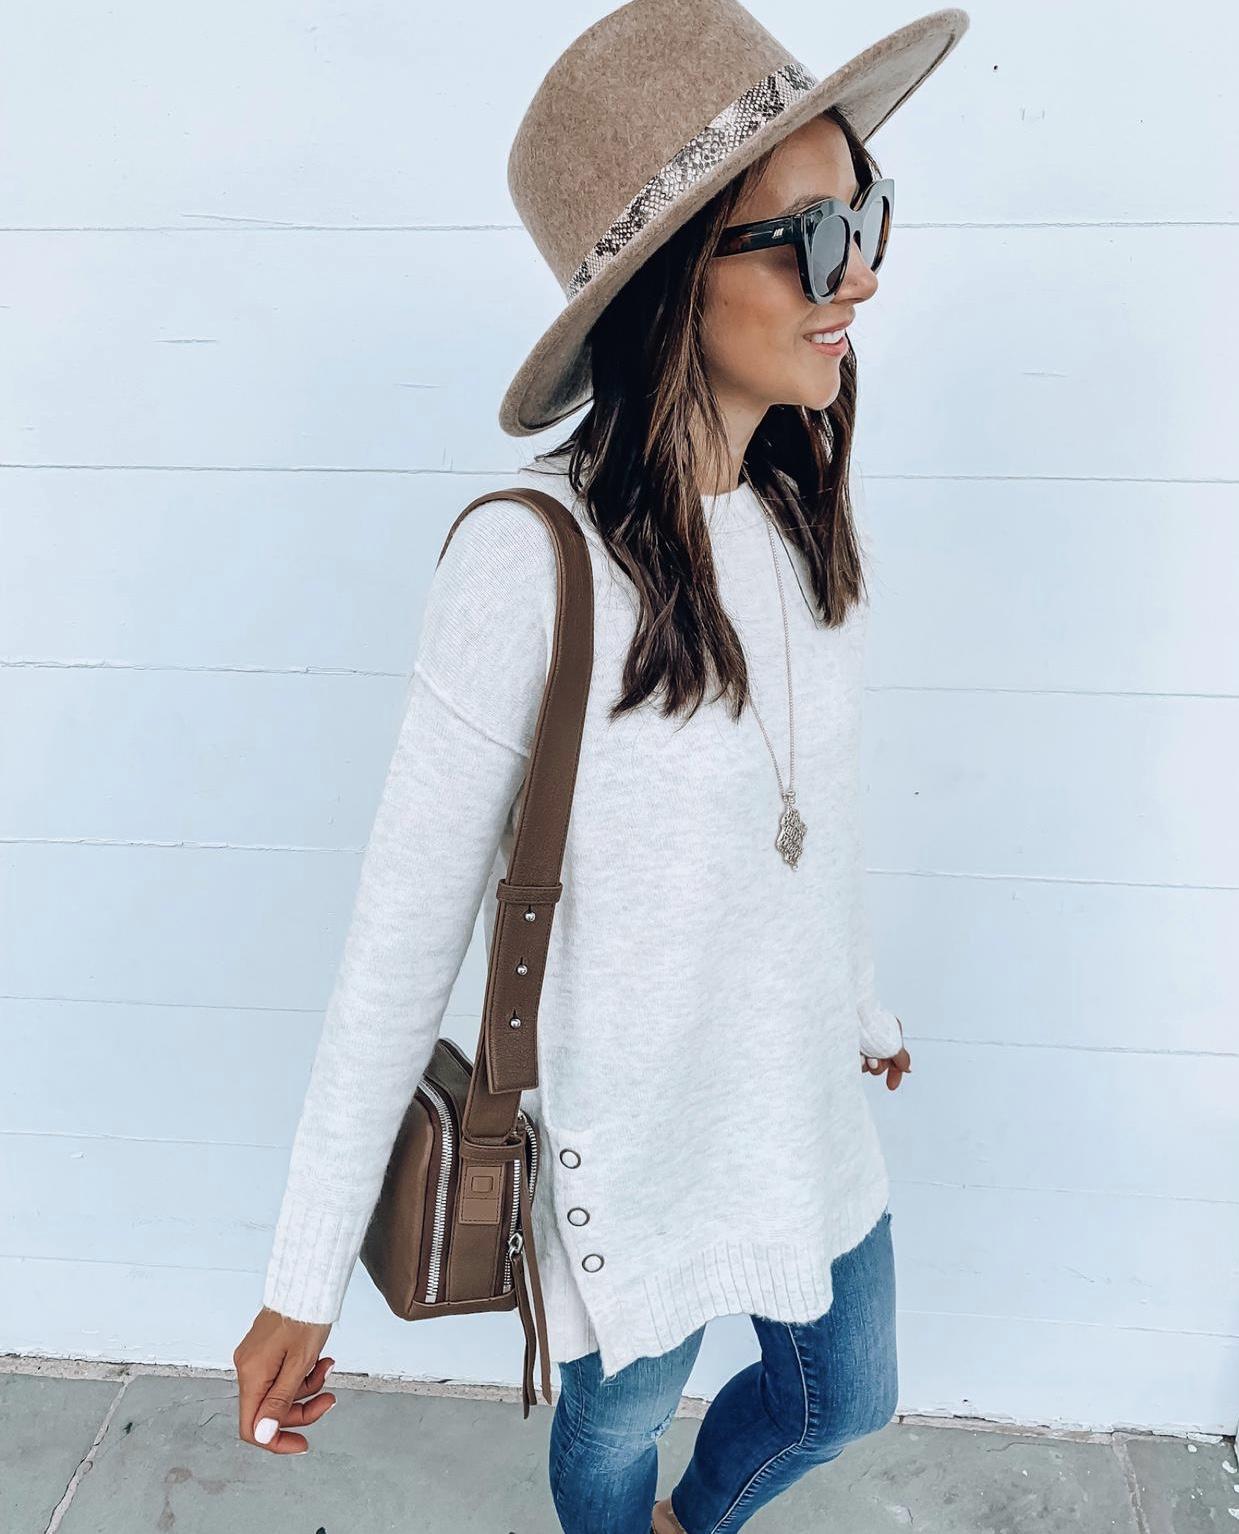 Woman wearing sweater tunic, hat, jeans